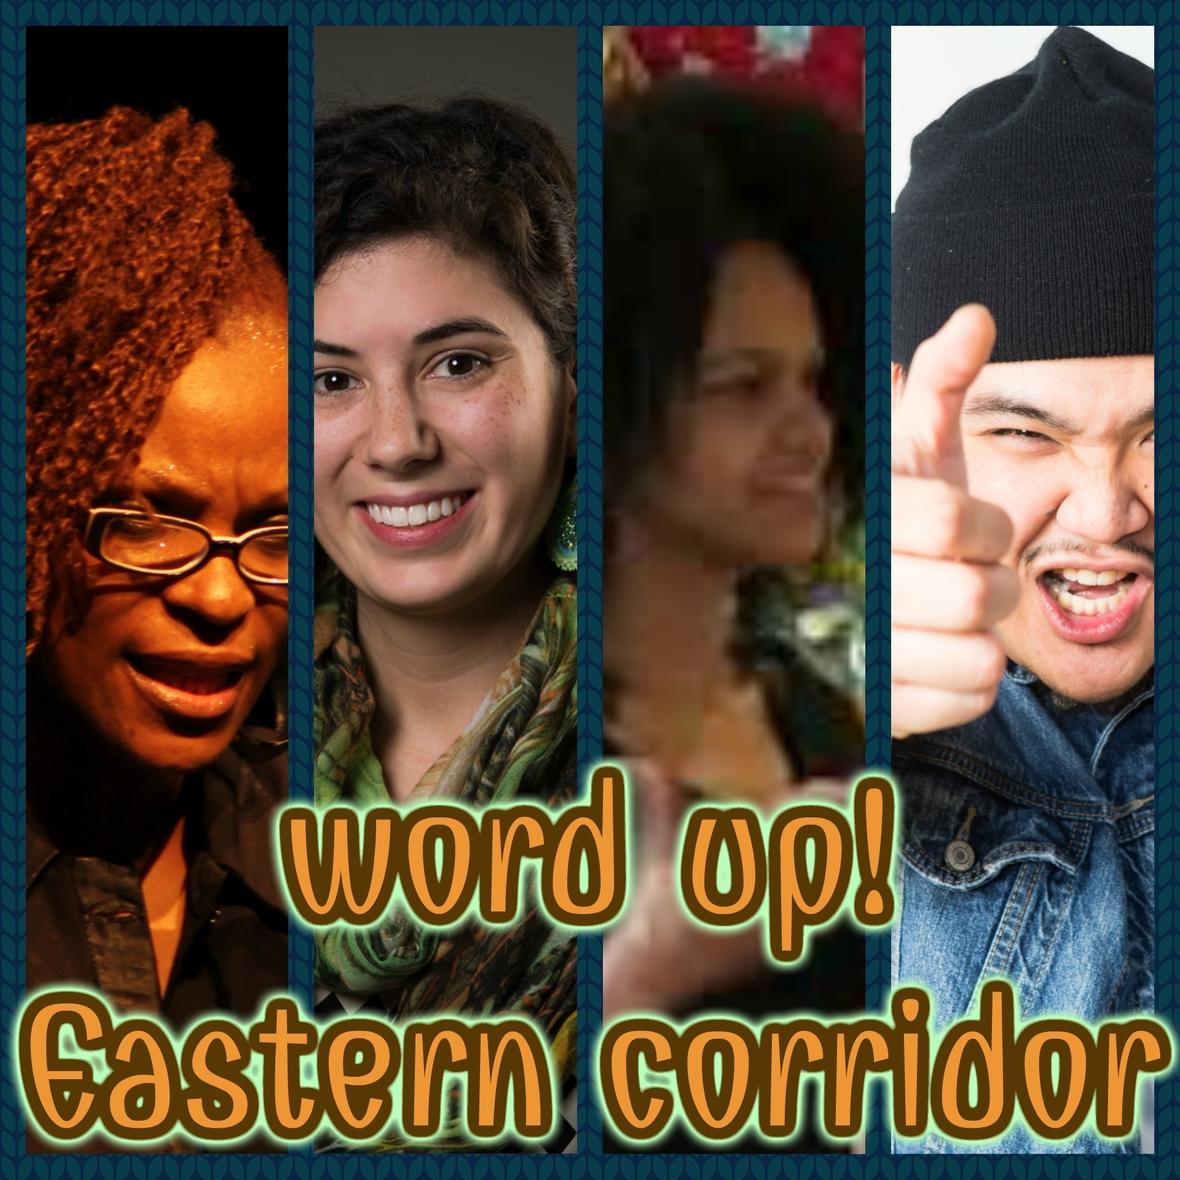 word up eastern corridor